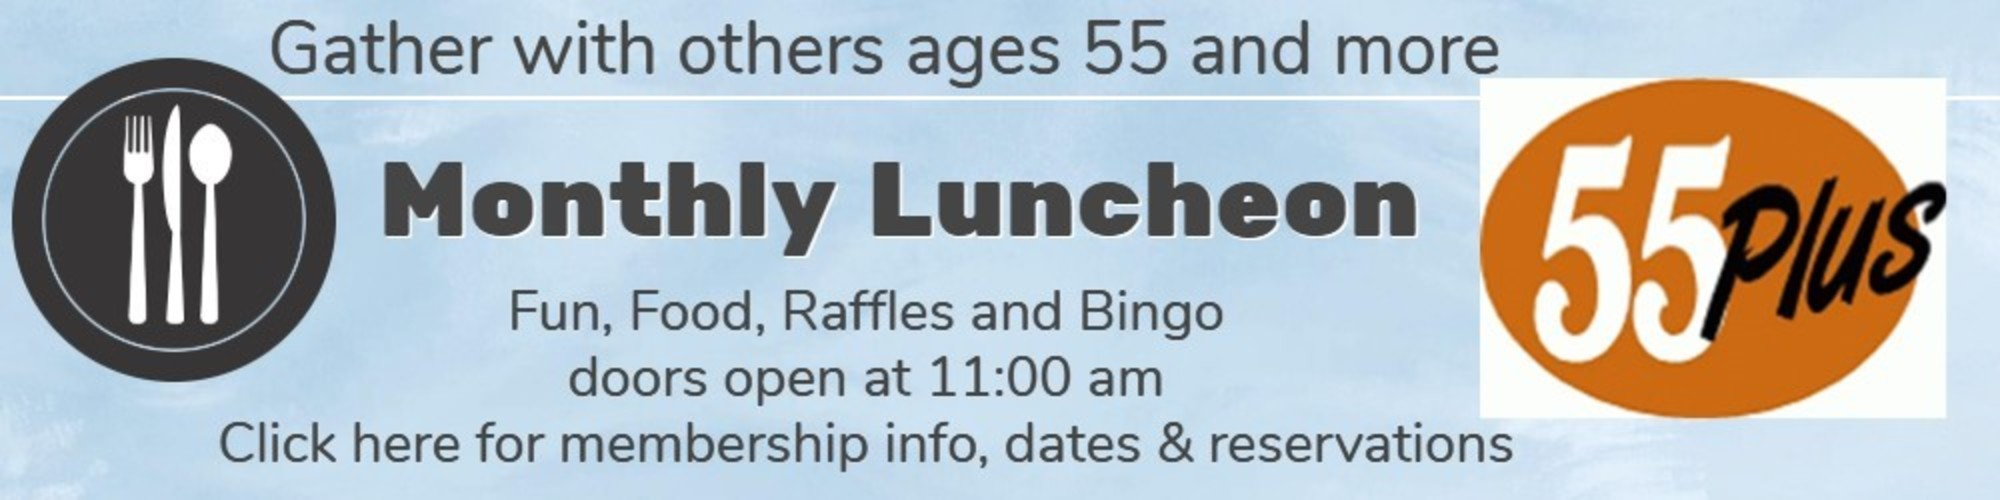 55 Plus Luncheons